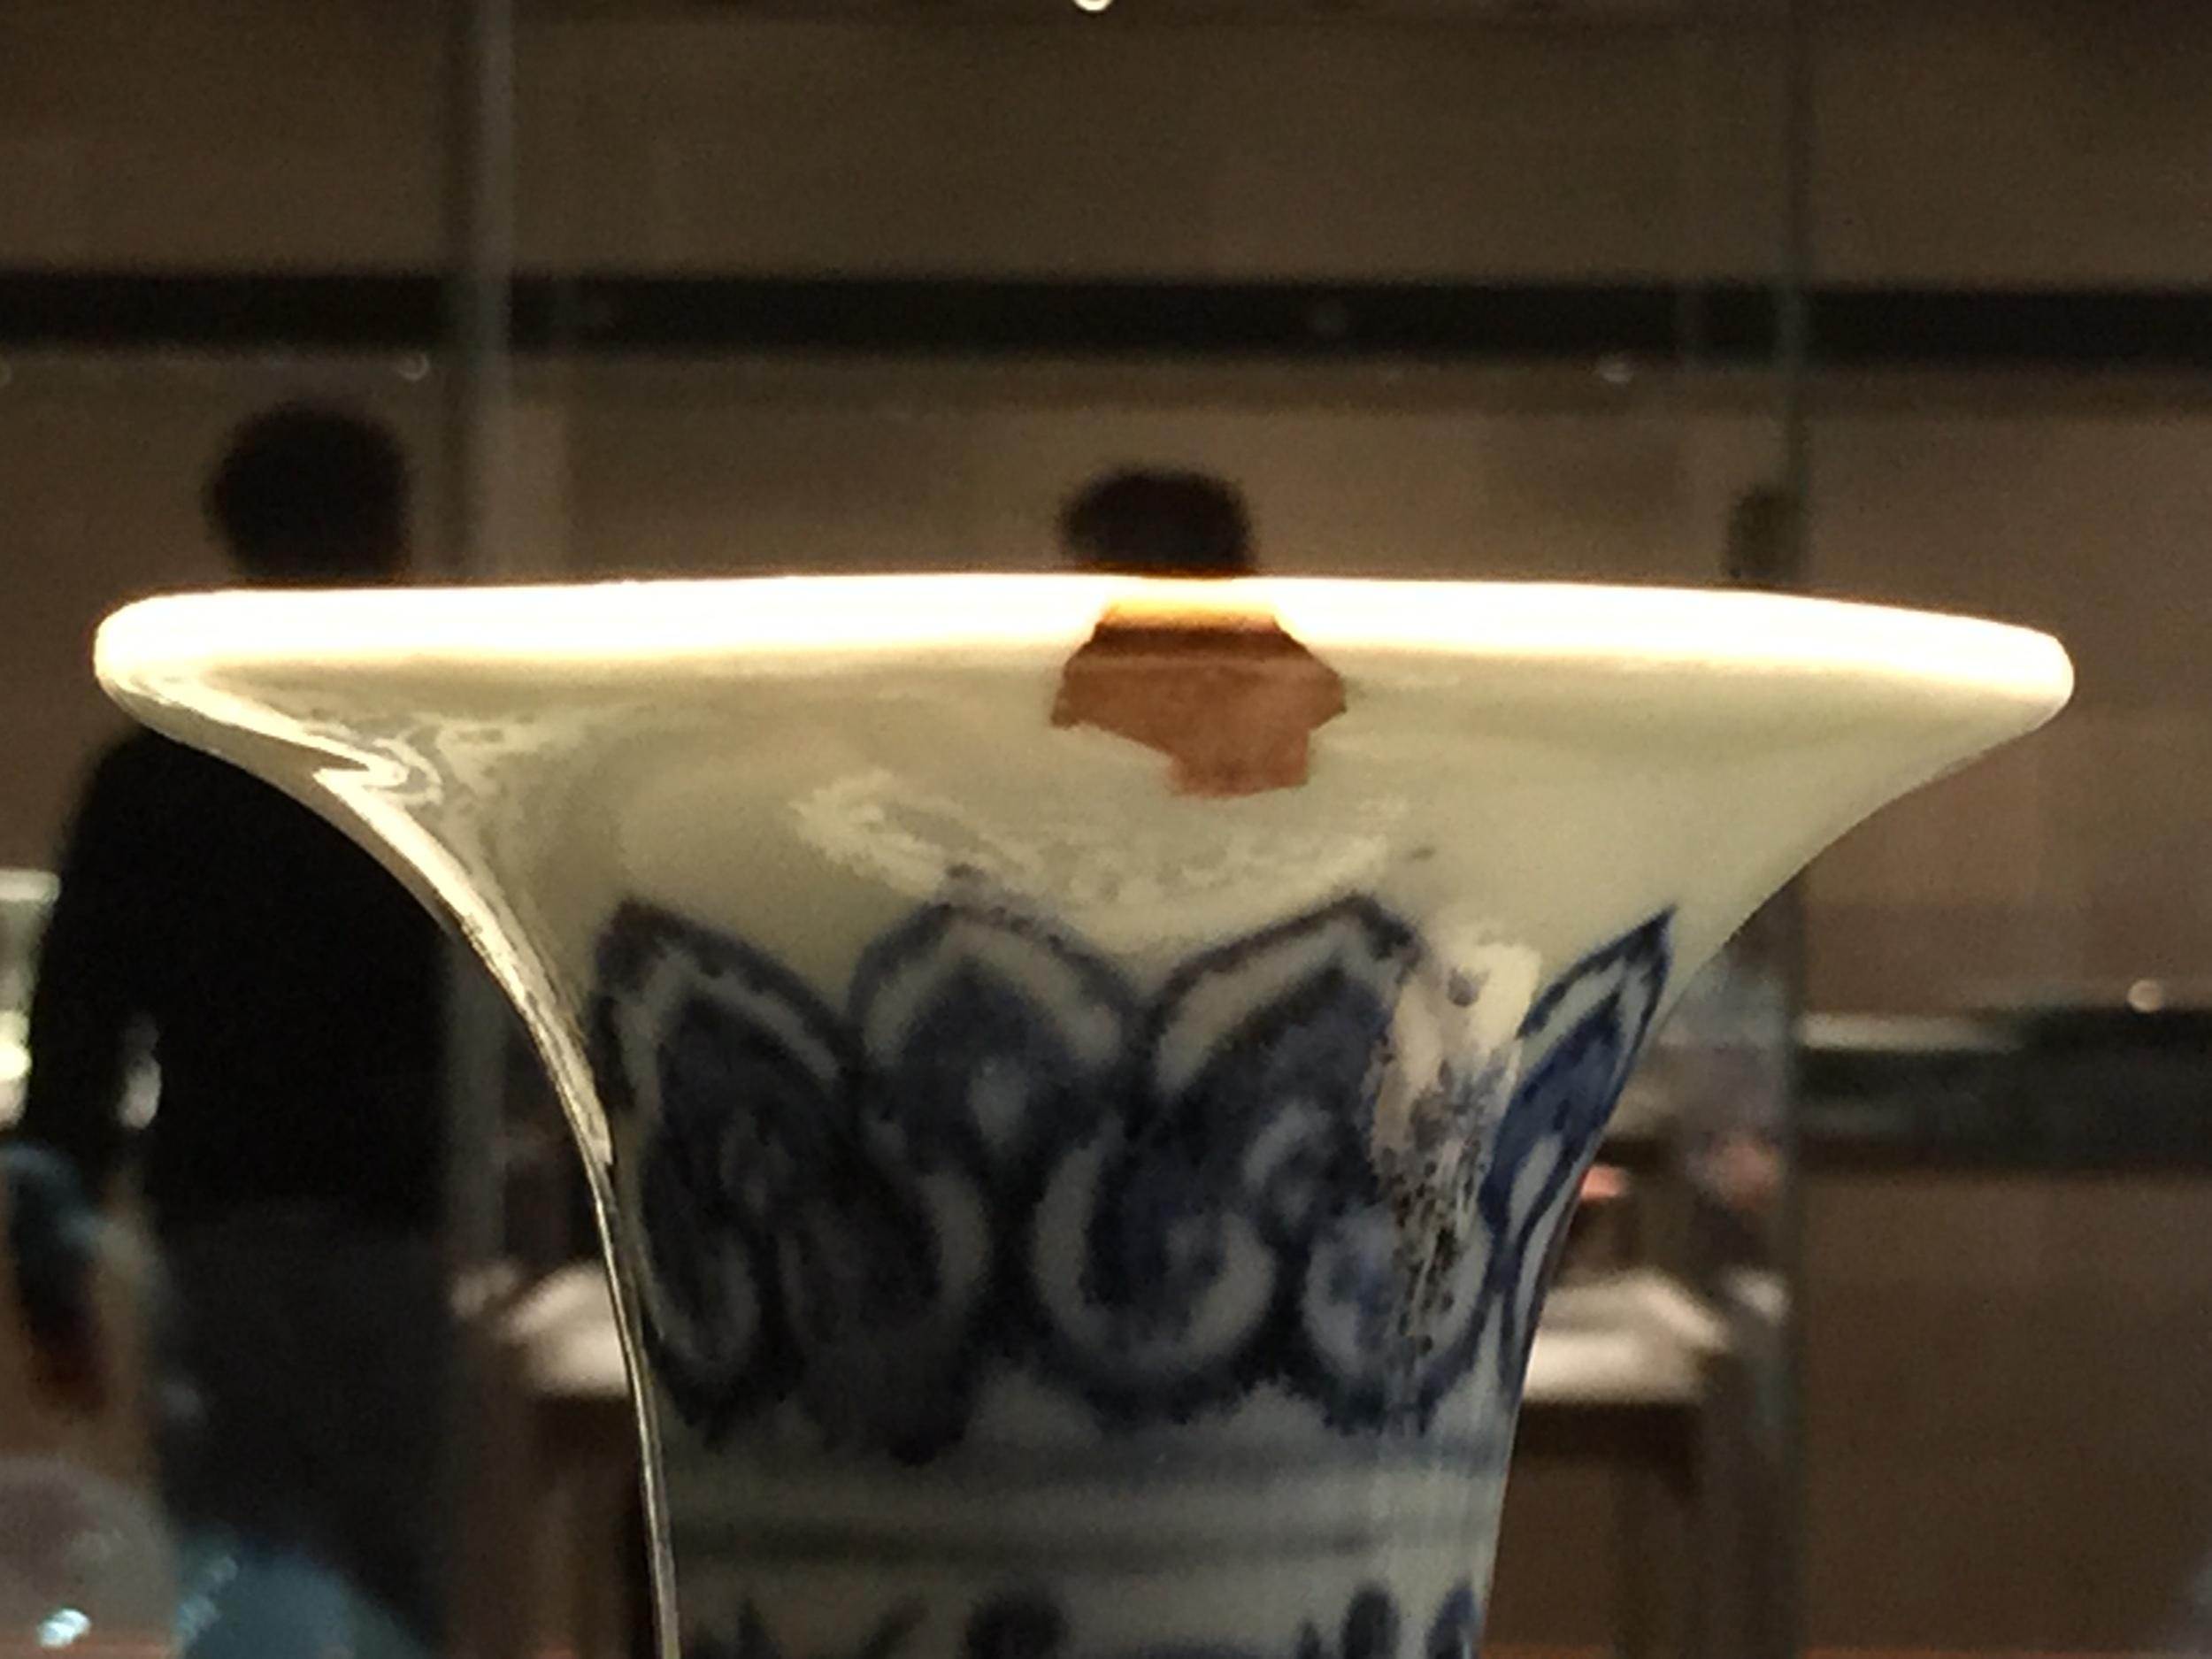 Chinese-Porcelain-British-Museum-Percival-David-jessewaugh.com-54.jpg